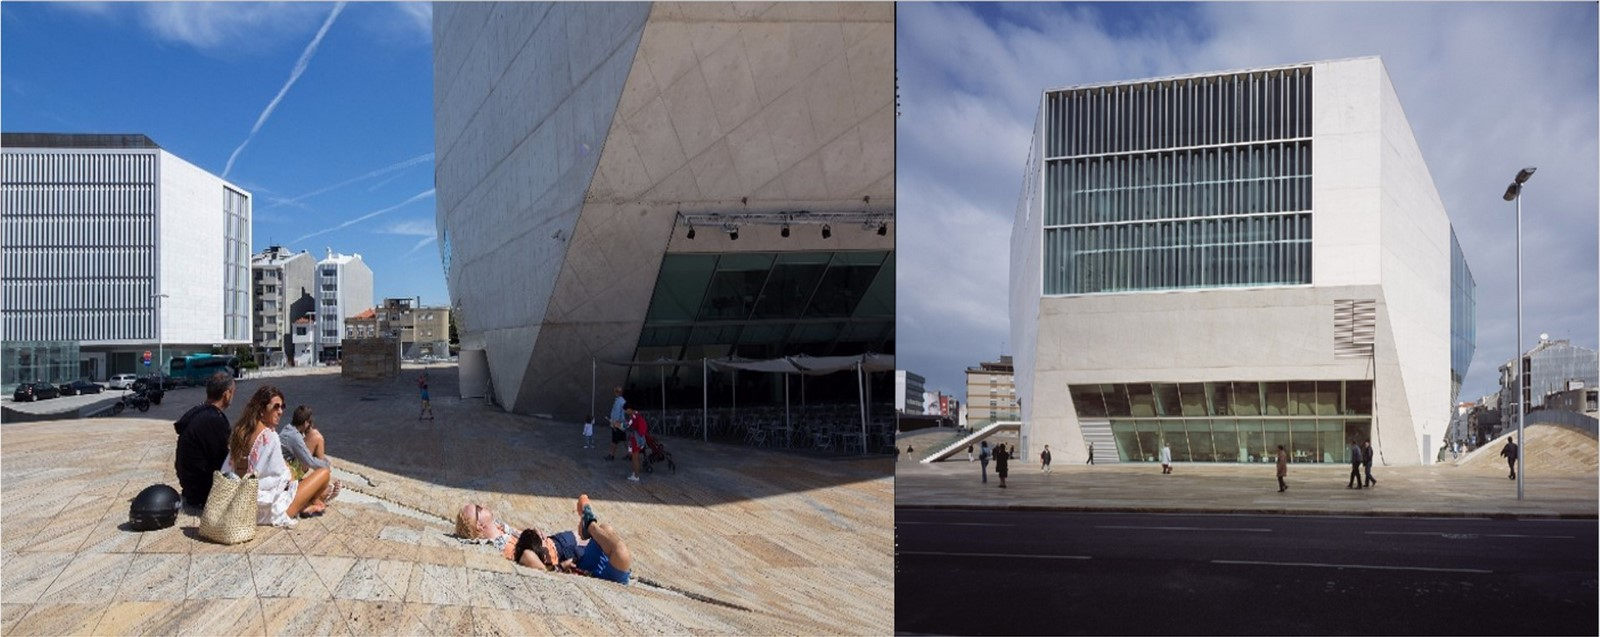 Casa Da Musica, Porto by Rem Koolhaas: The Asymmetrical Polyhedron - Sheet3